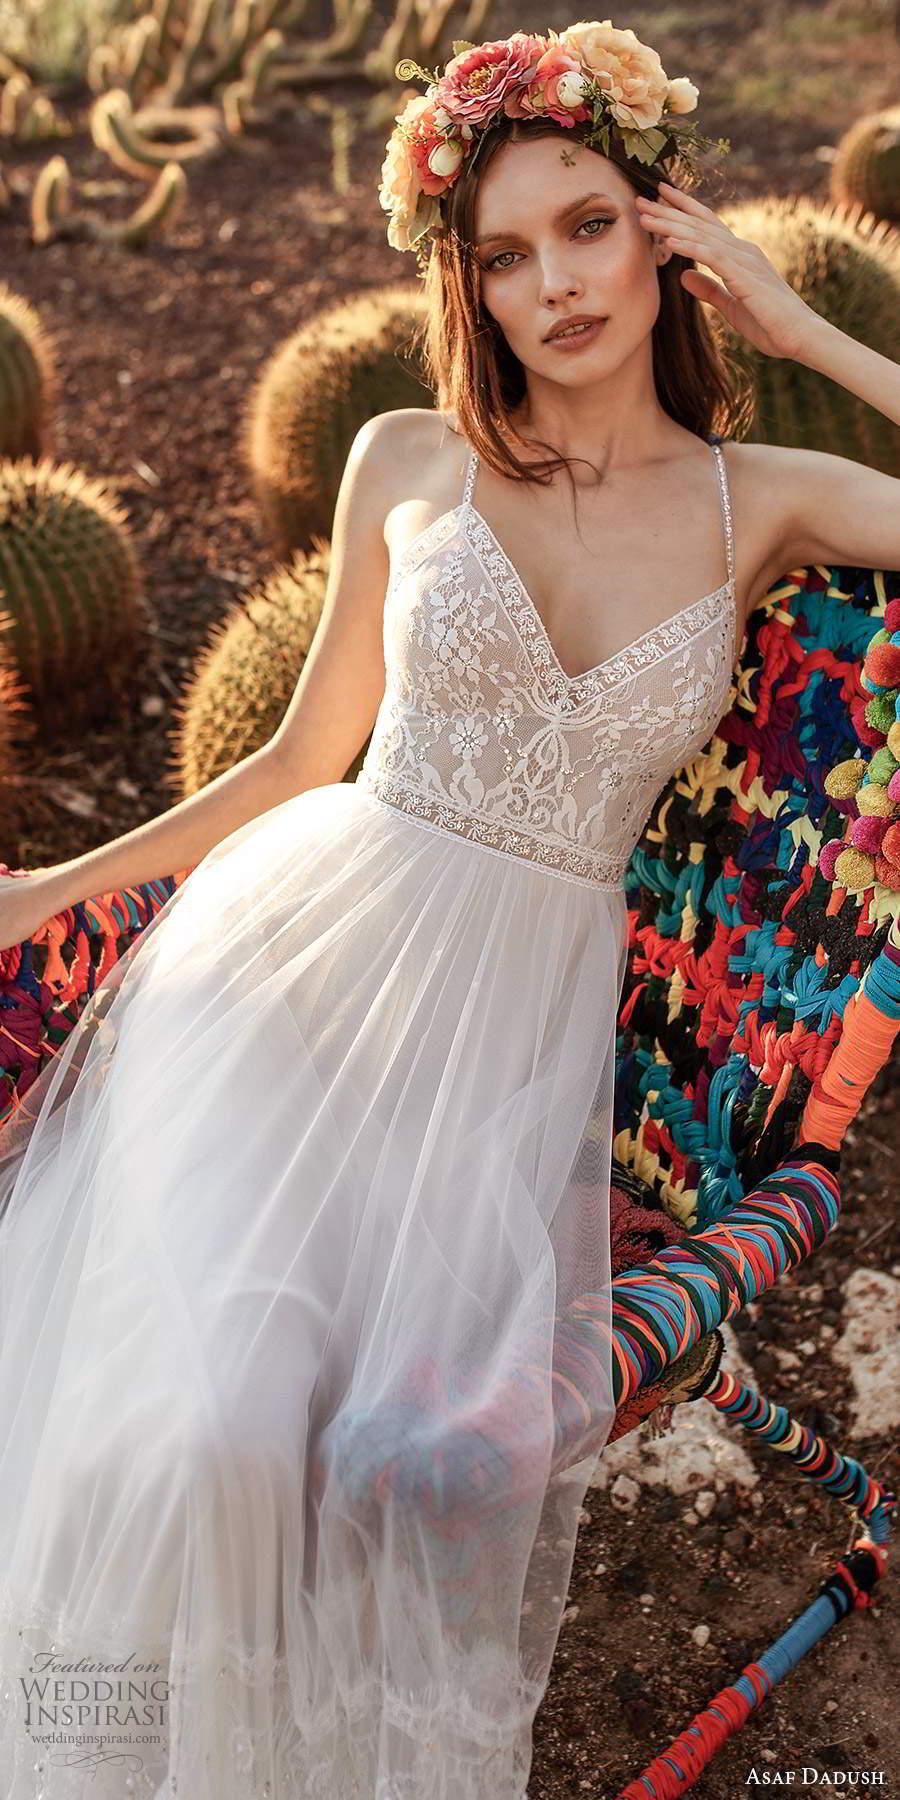 asaf dadush 2020 bridal sleeveless thin beaded straps v neckline embellished bodice a line ball gown wedding dress open back (11) zv